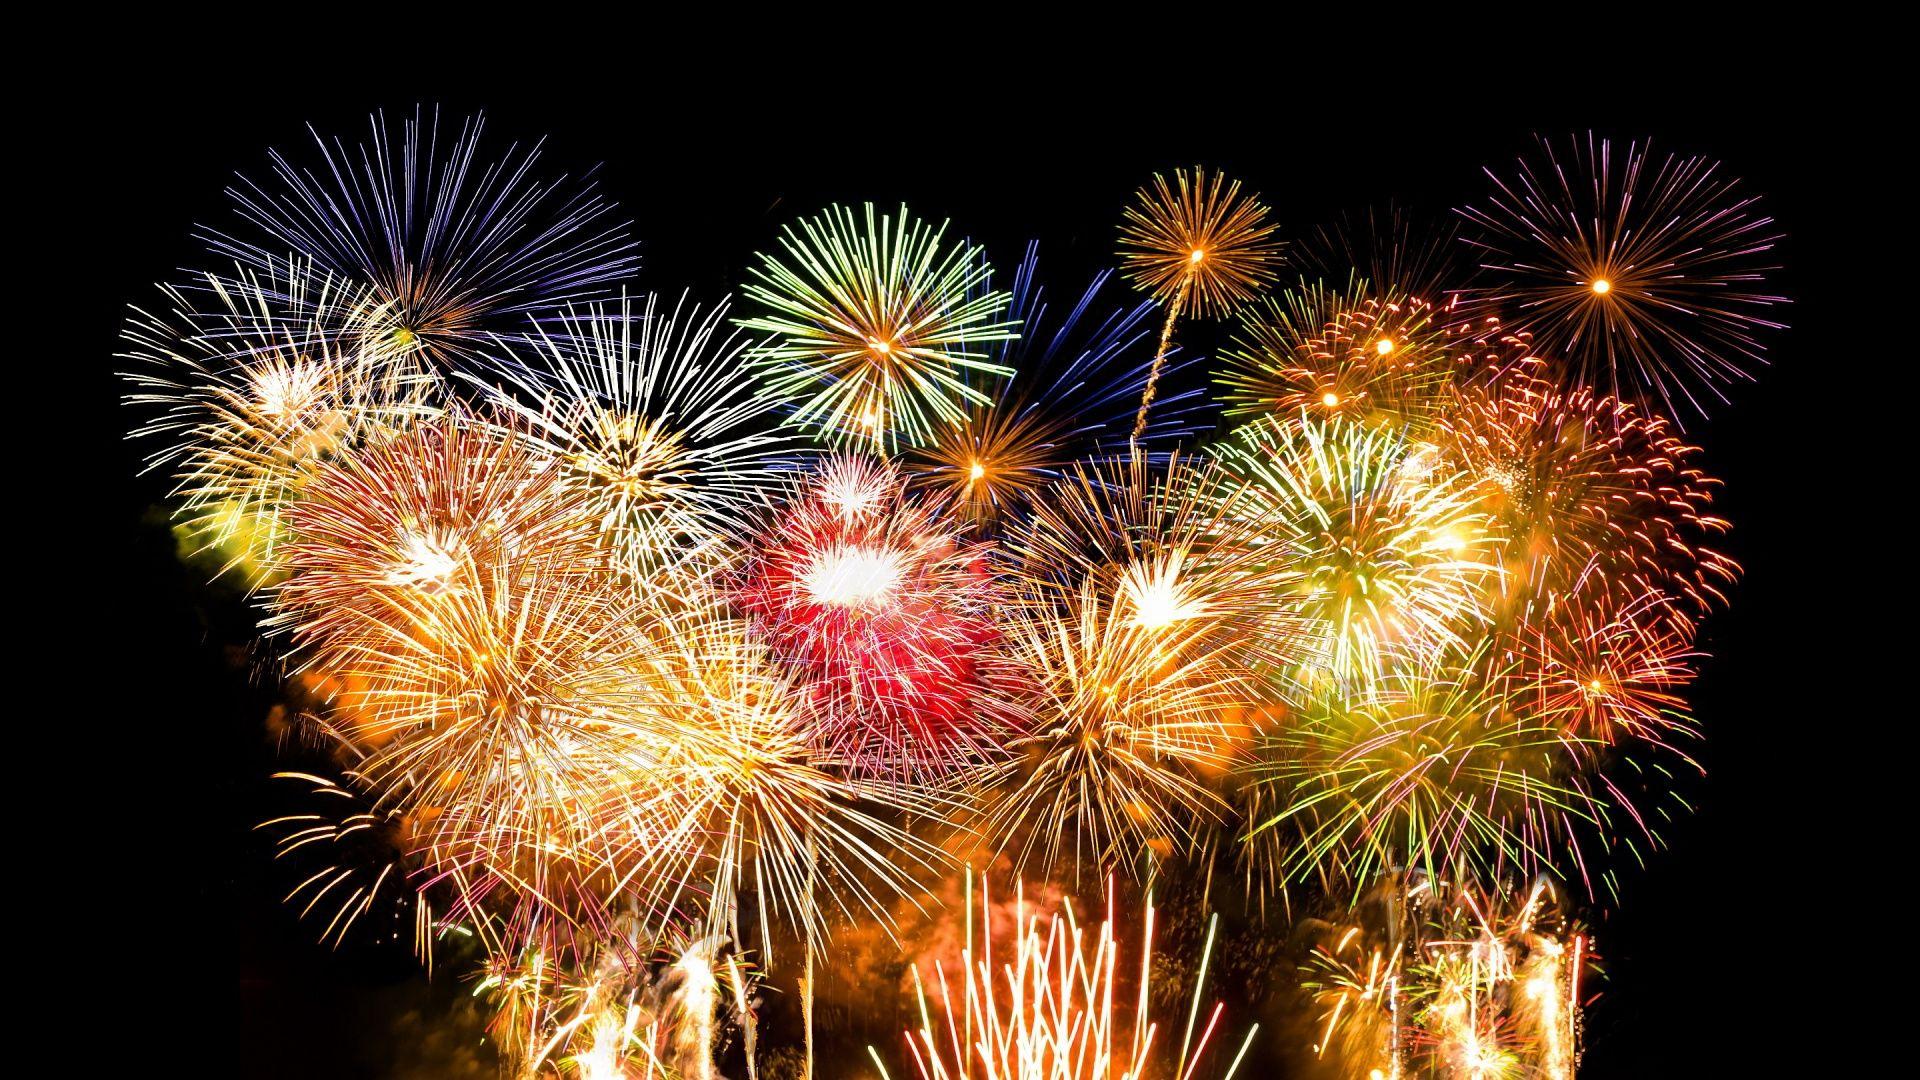 Rainbow Firework Wallpapers Free New Years Eve Fireworks Fireworks Fireworks Wallpaper